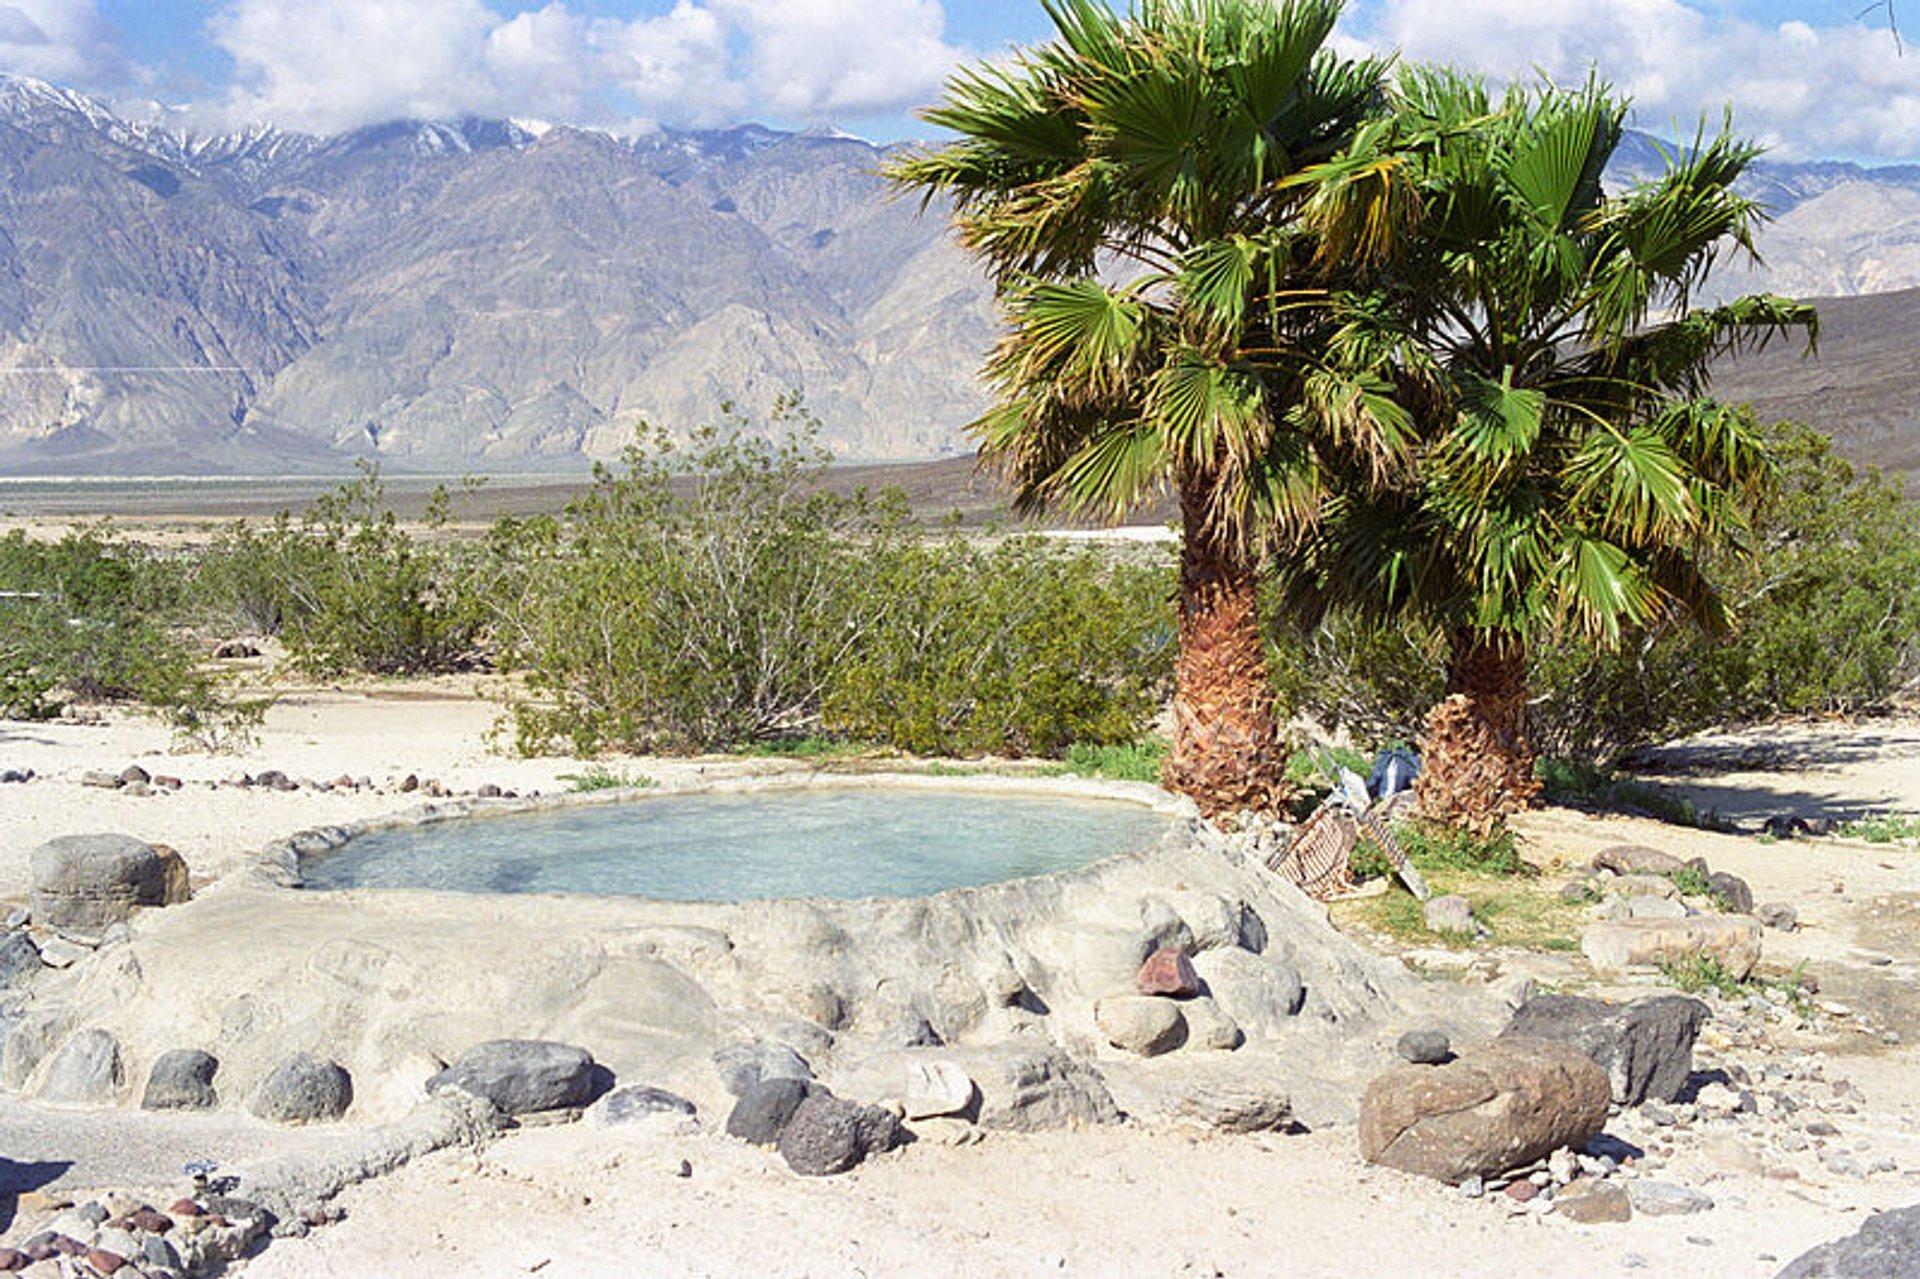 Saline Valley Hot Springs in Death Valley 2019 - Best Time